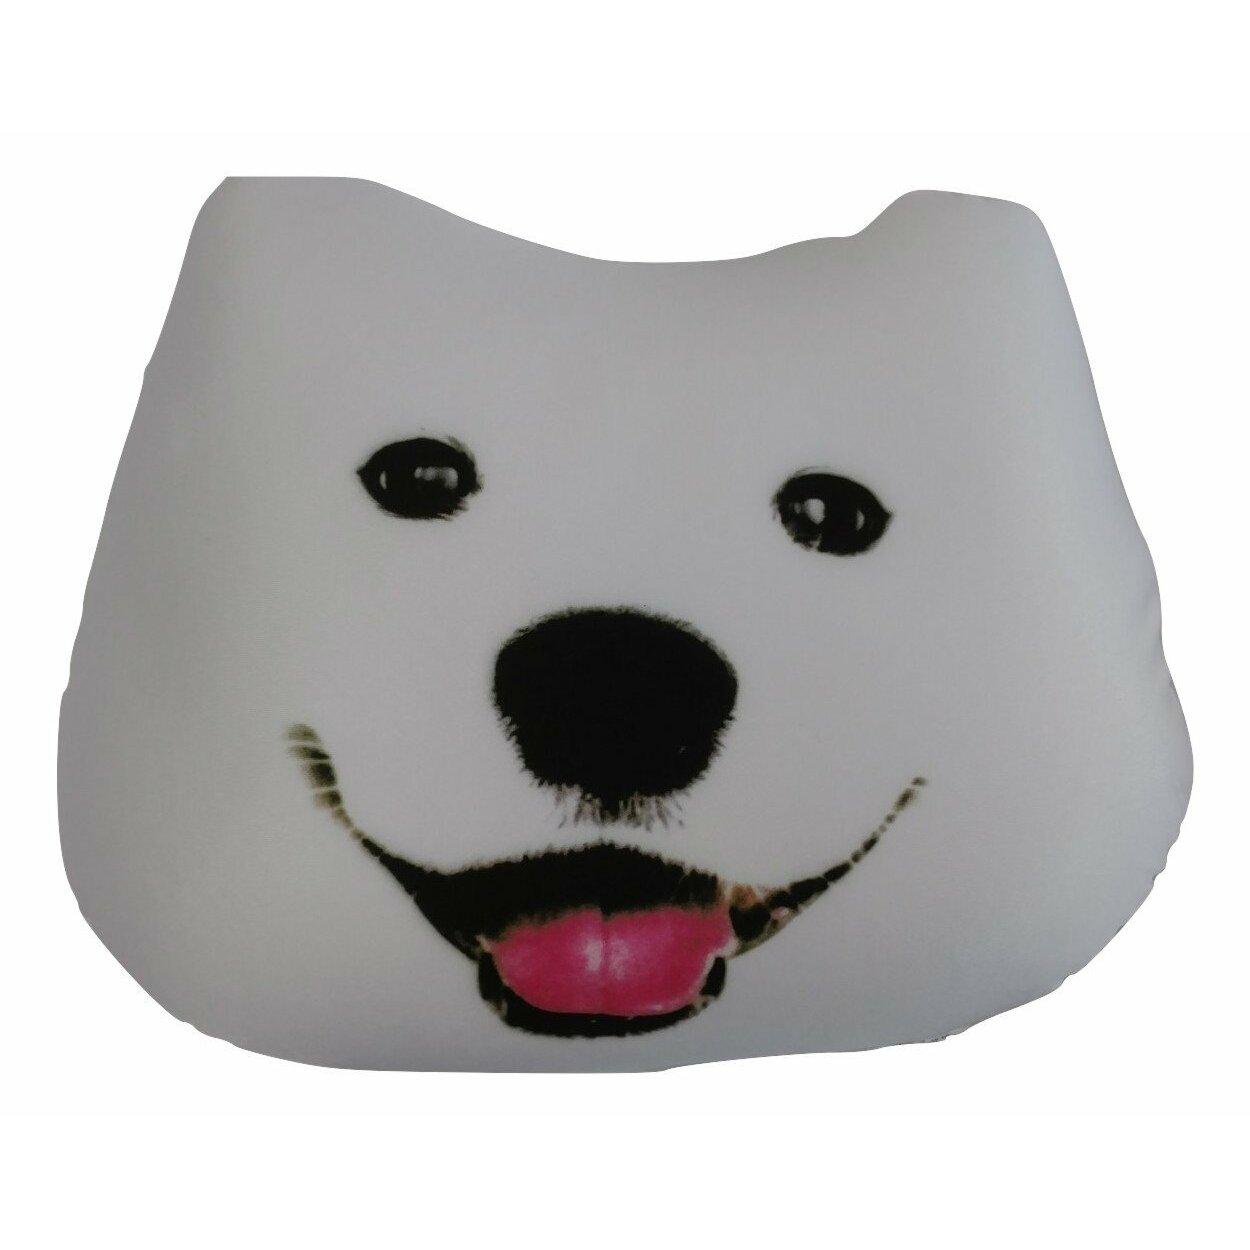 Cute Dog Pillow Beds : Tache Home Fashion Cute Puppy Dog Microbead Realistic Throw Pillow & Reviews Wayfair